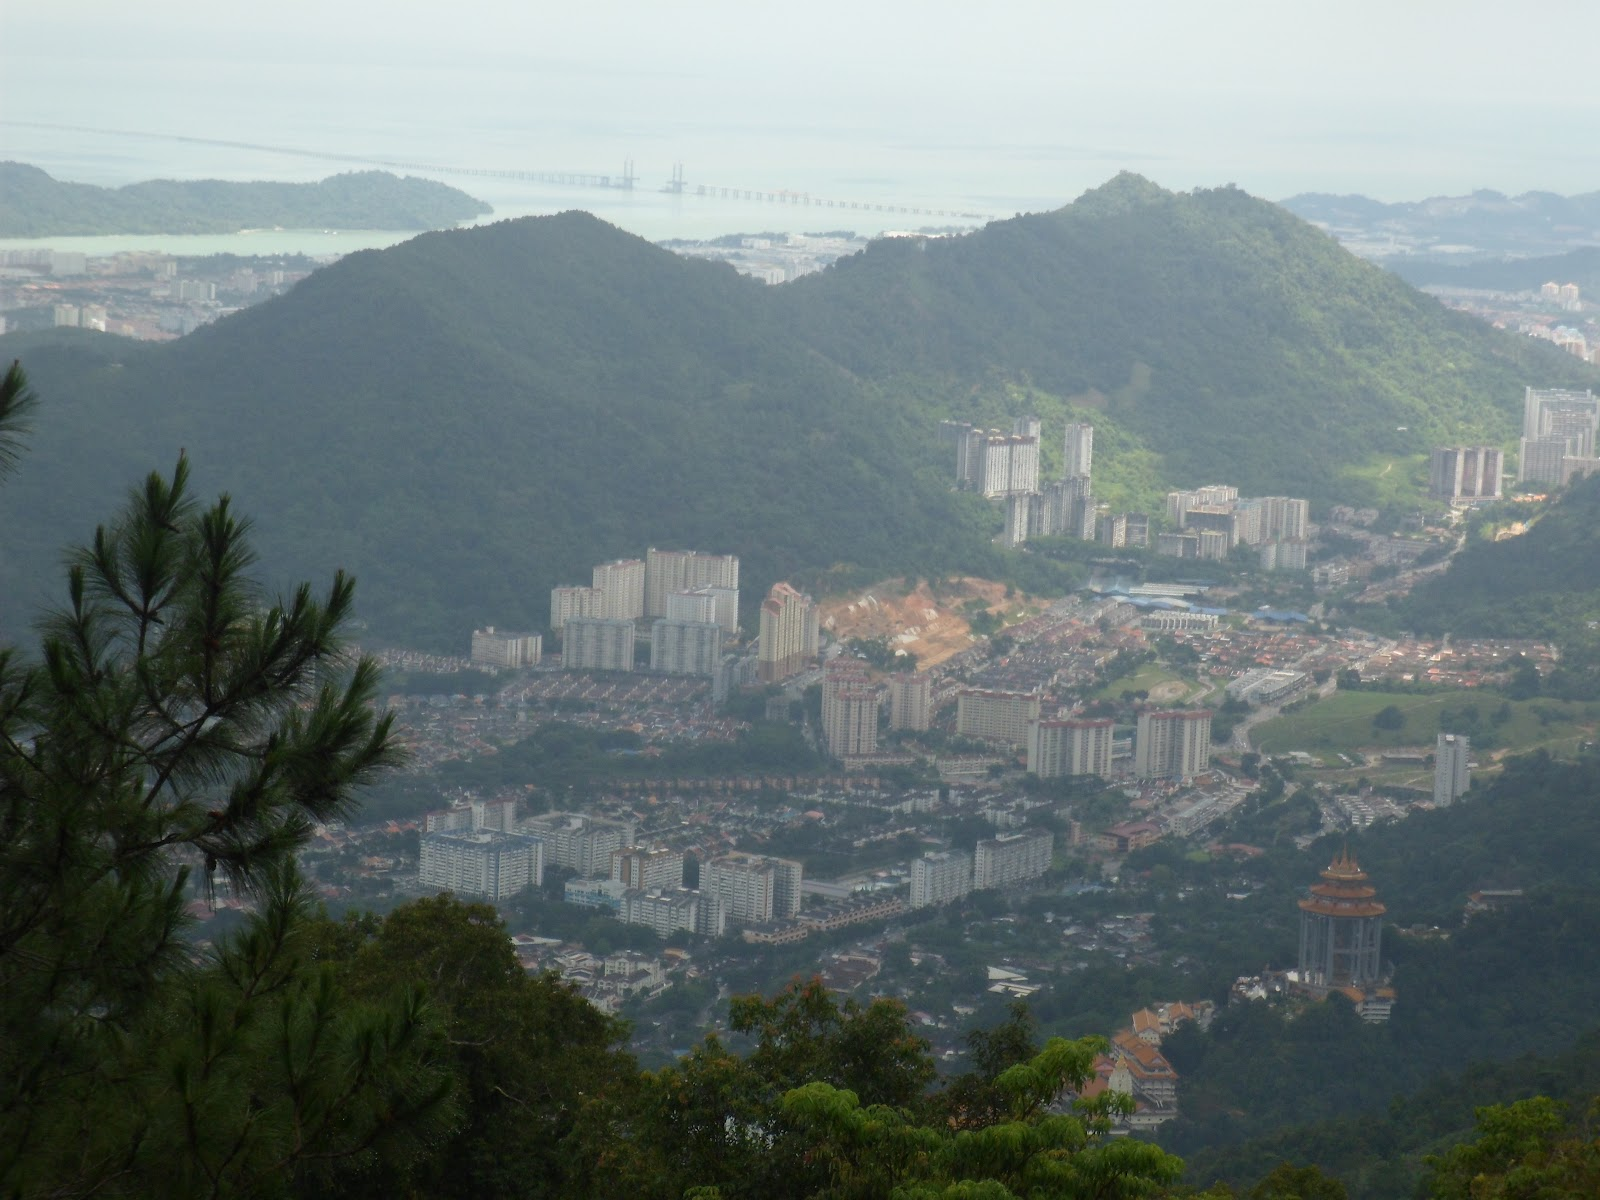 Jalan Biar Ke Depan Cerita Bukit Bendera Pulau Pinang